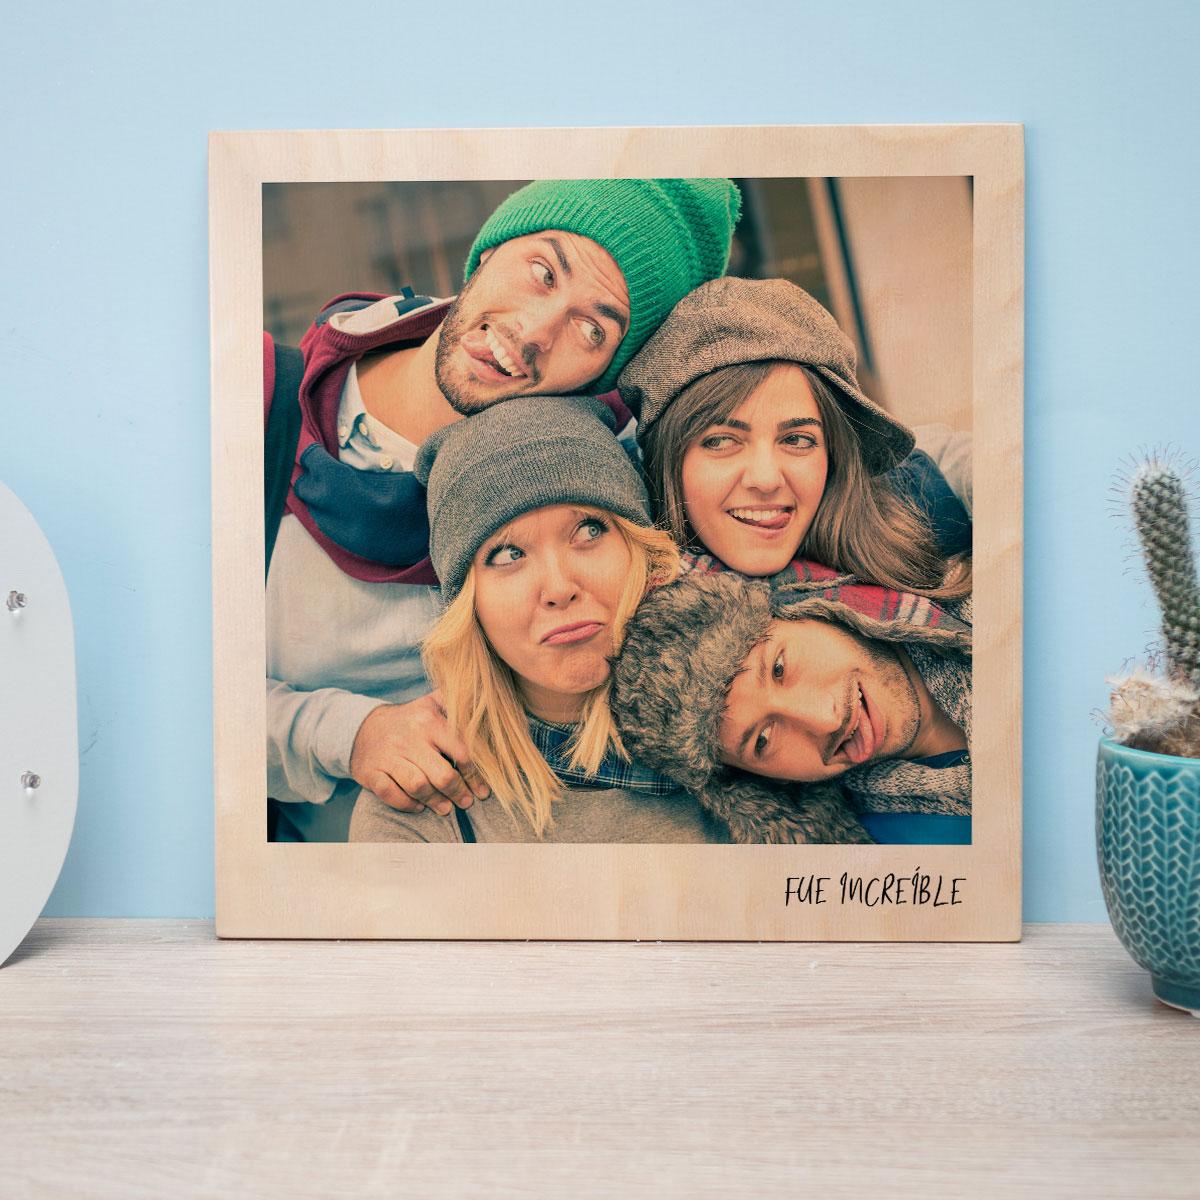 Kerstcadeau Personaliseerbare foto op hout in polaroid look